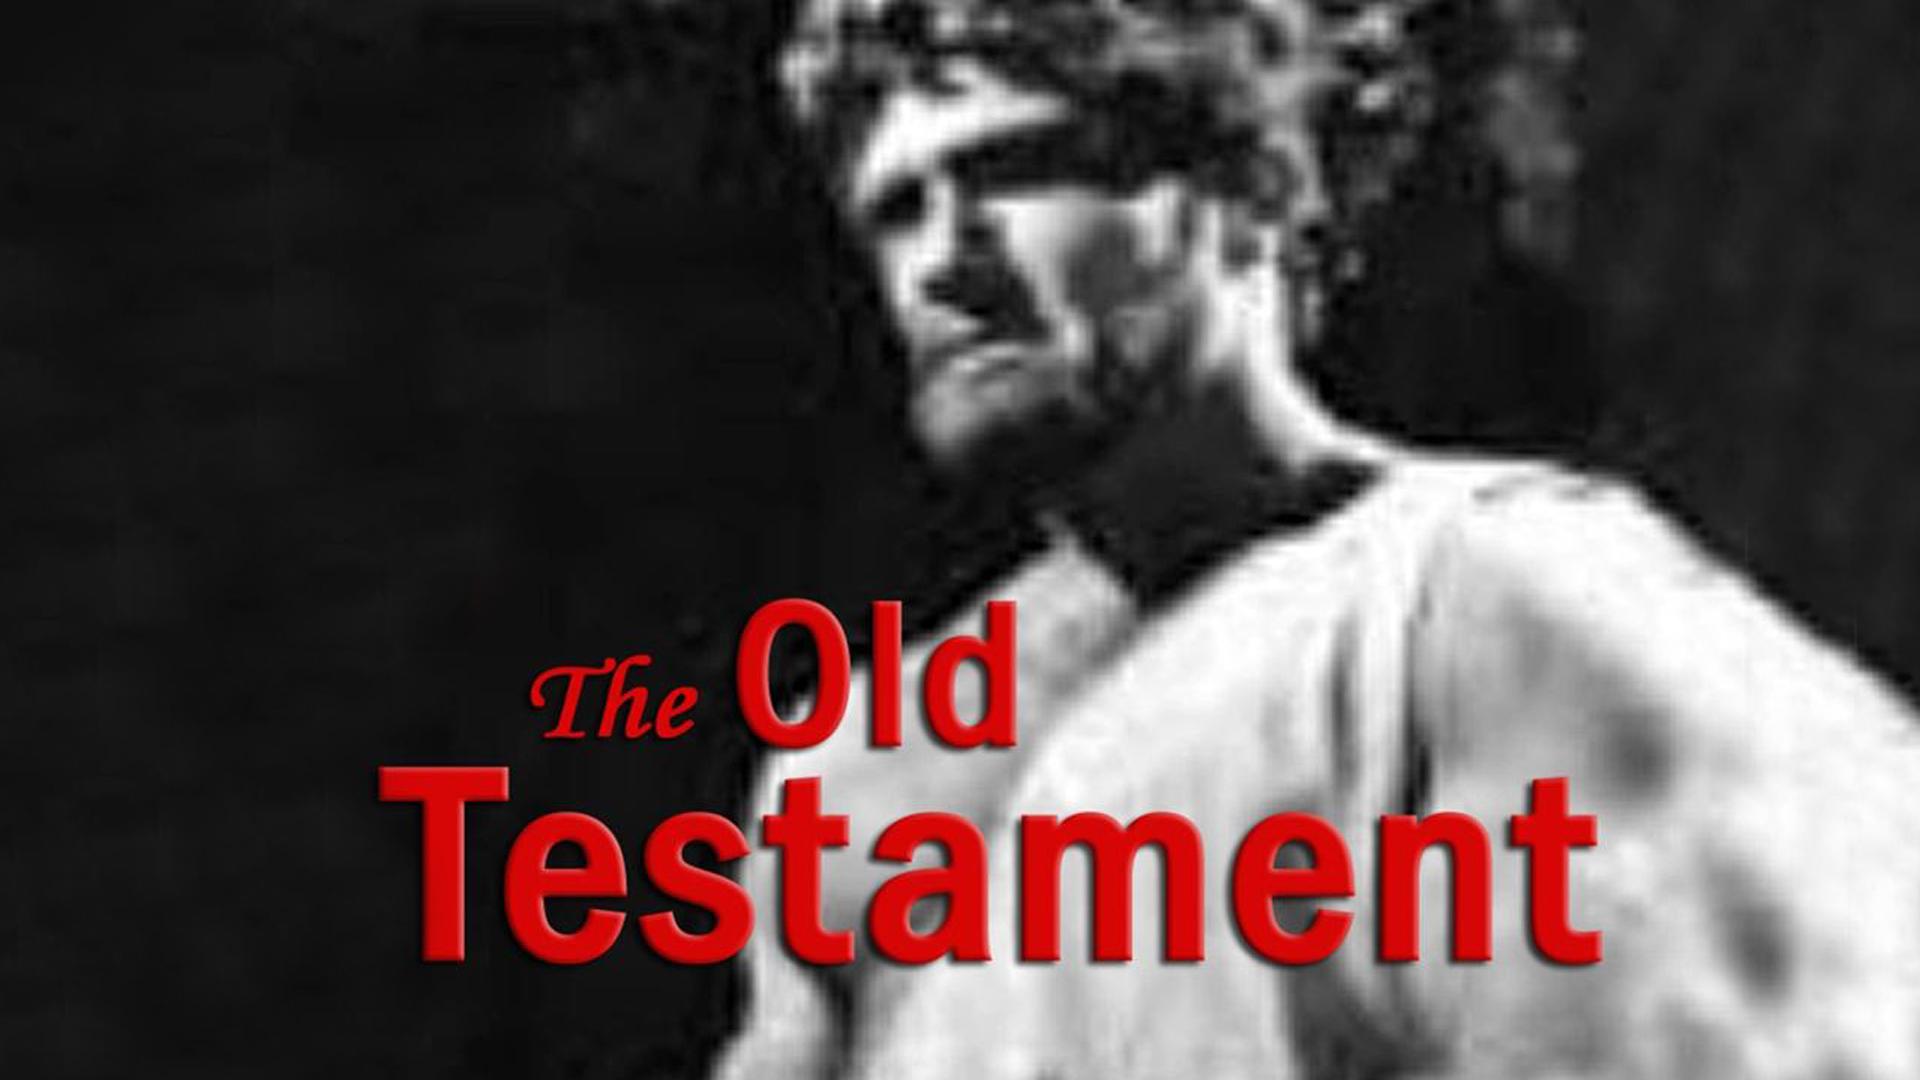 Old Testament (1963)